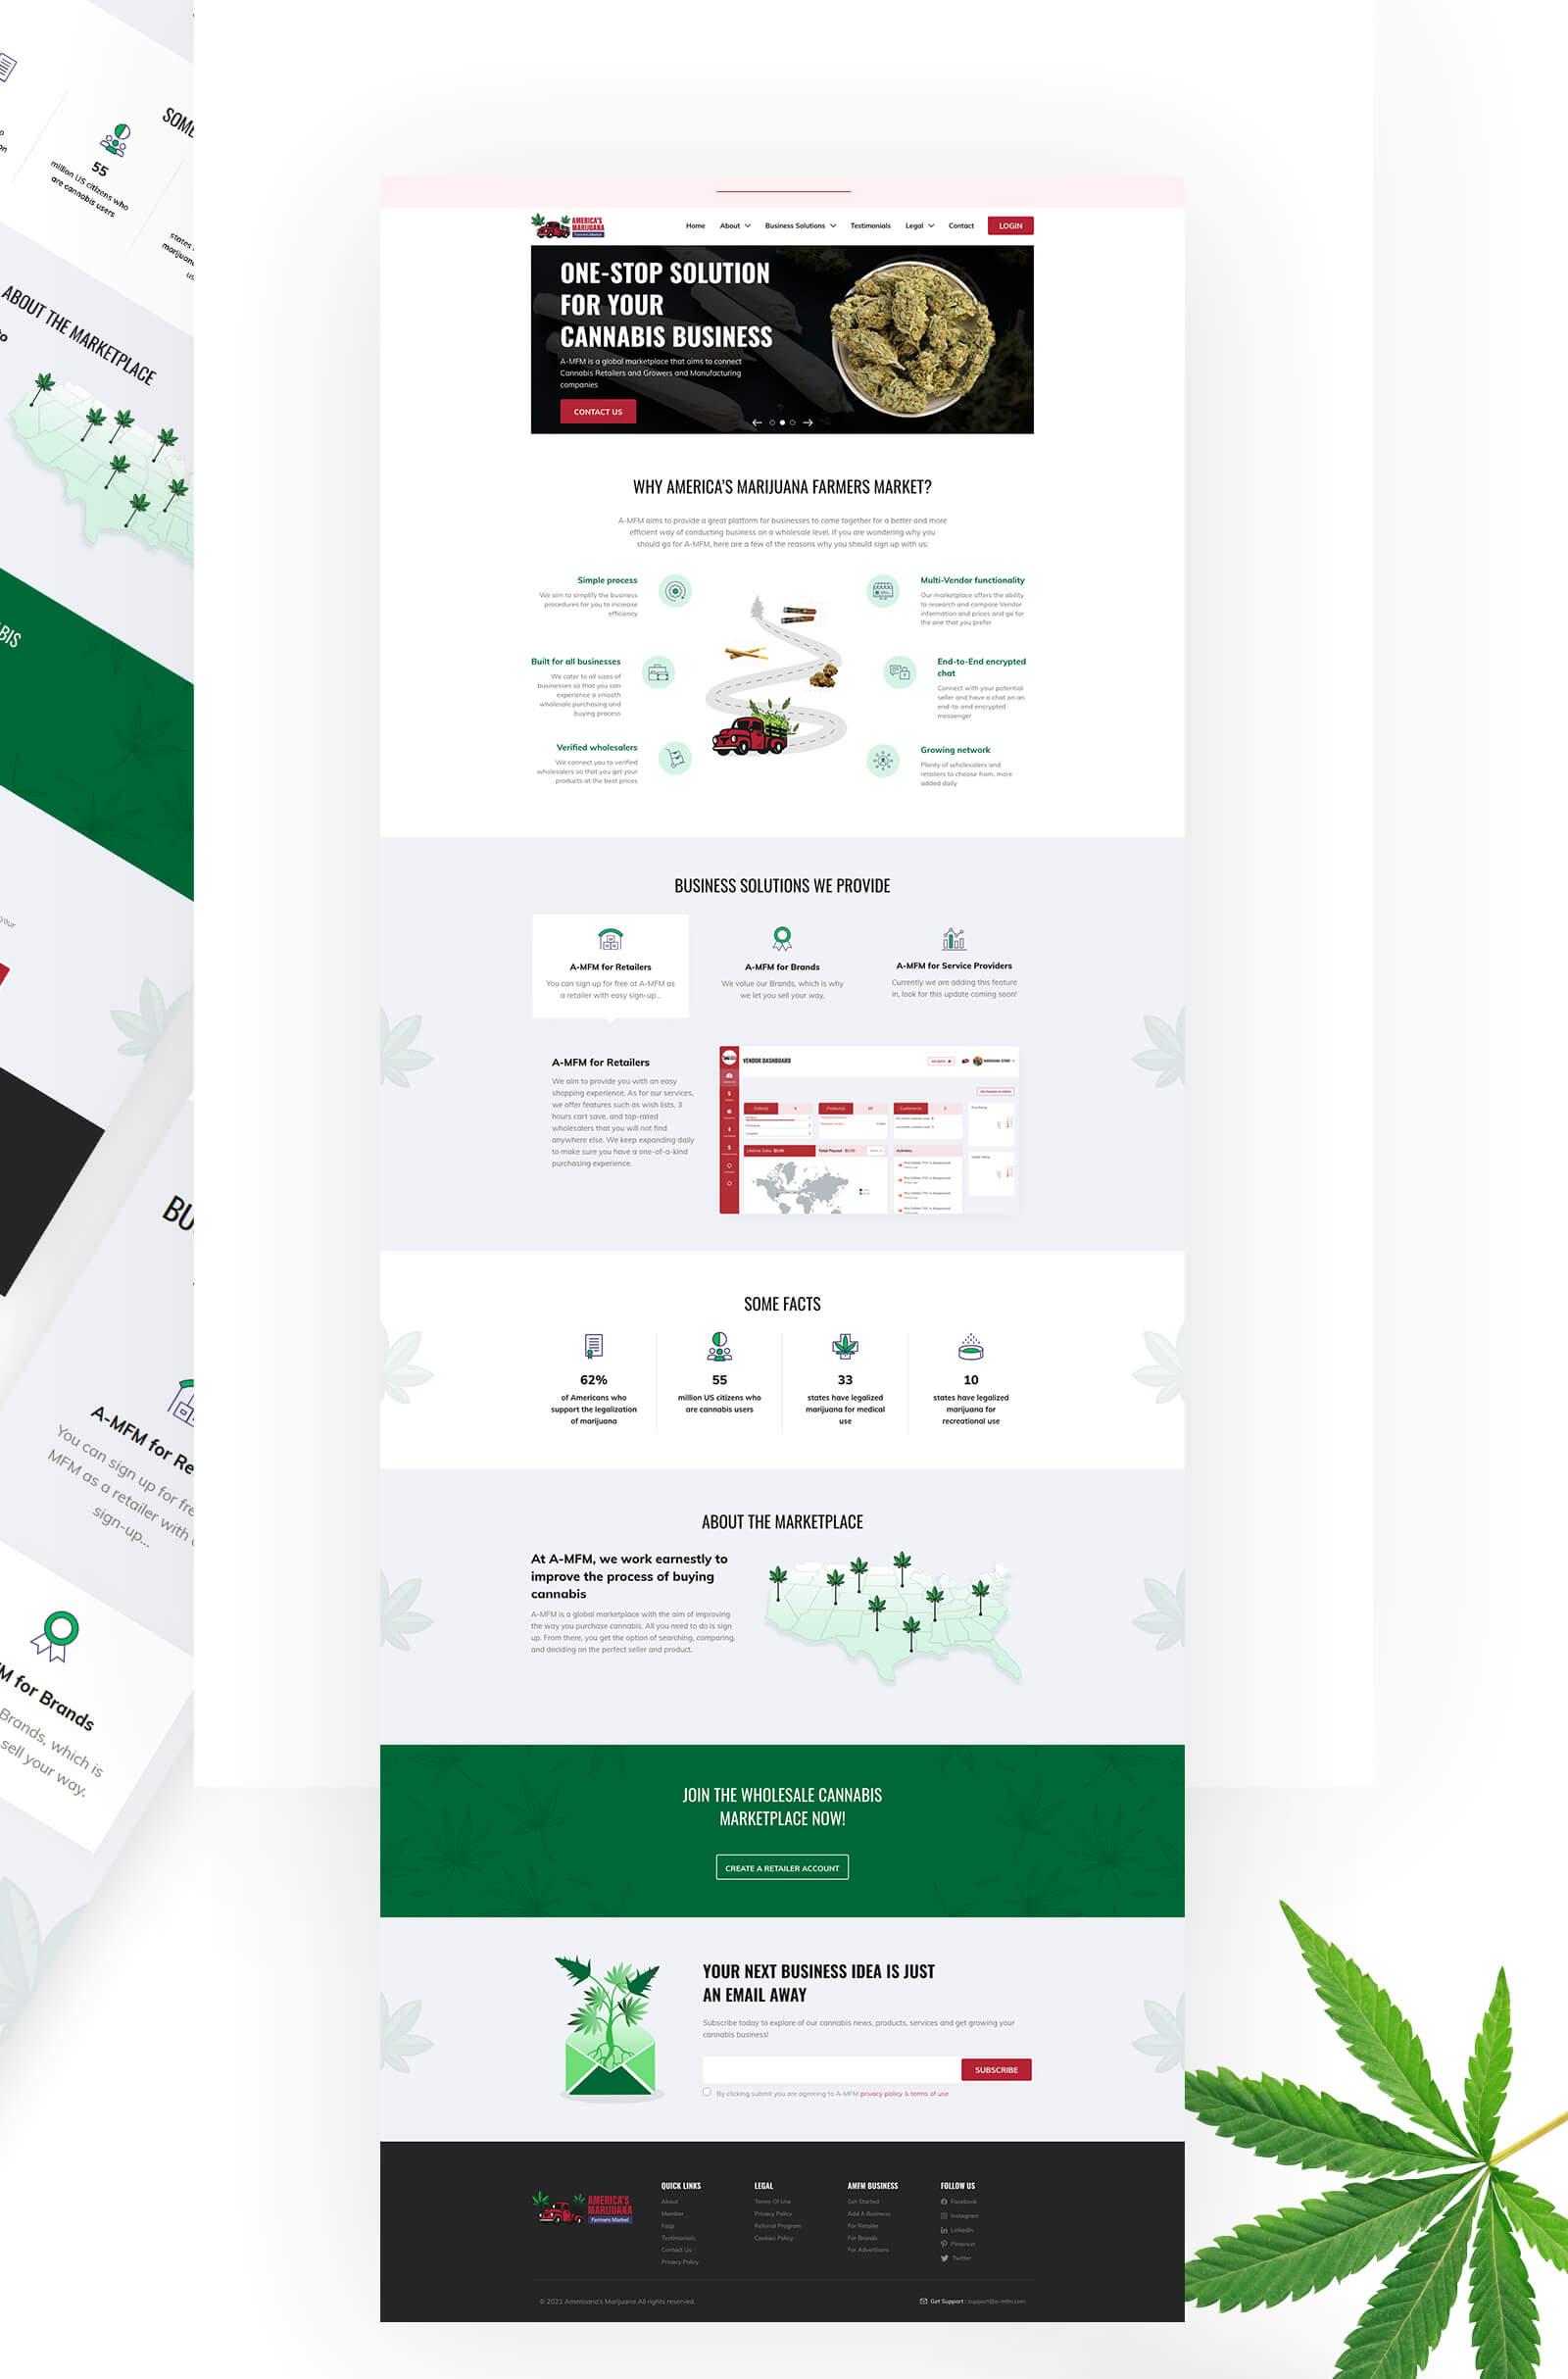 A-MFM's Landing Page